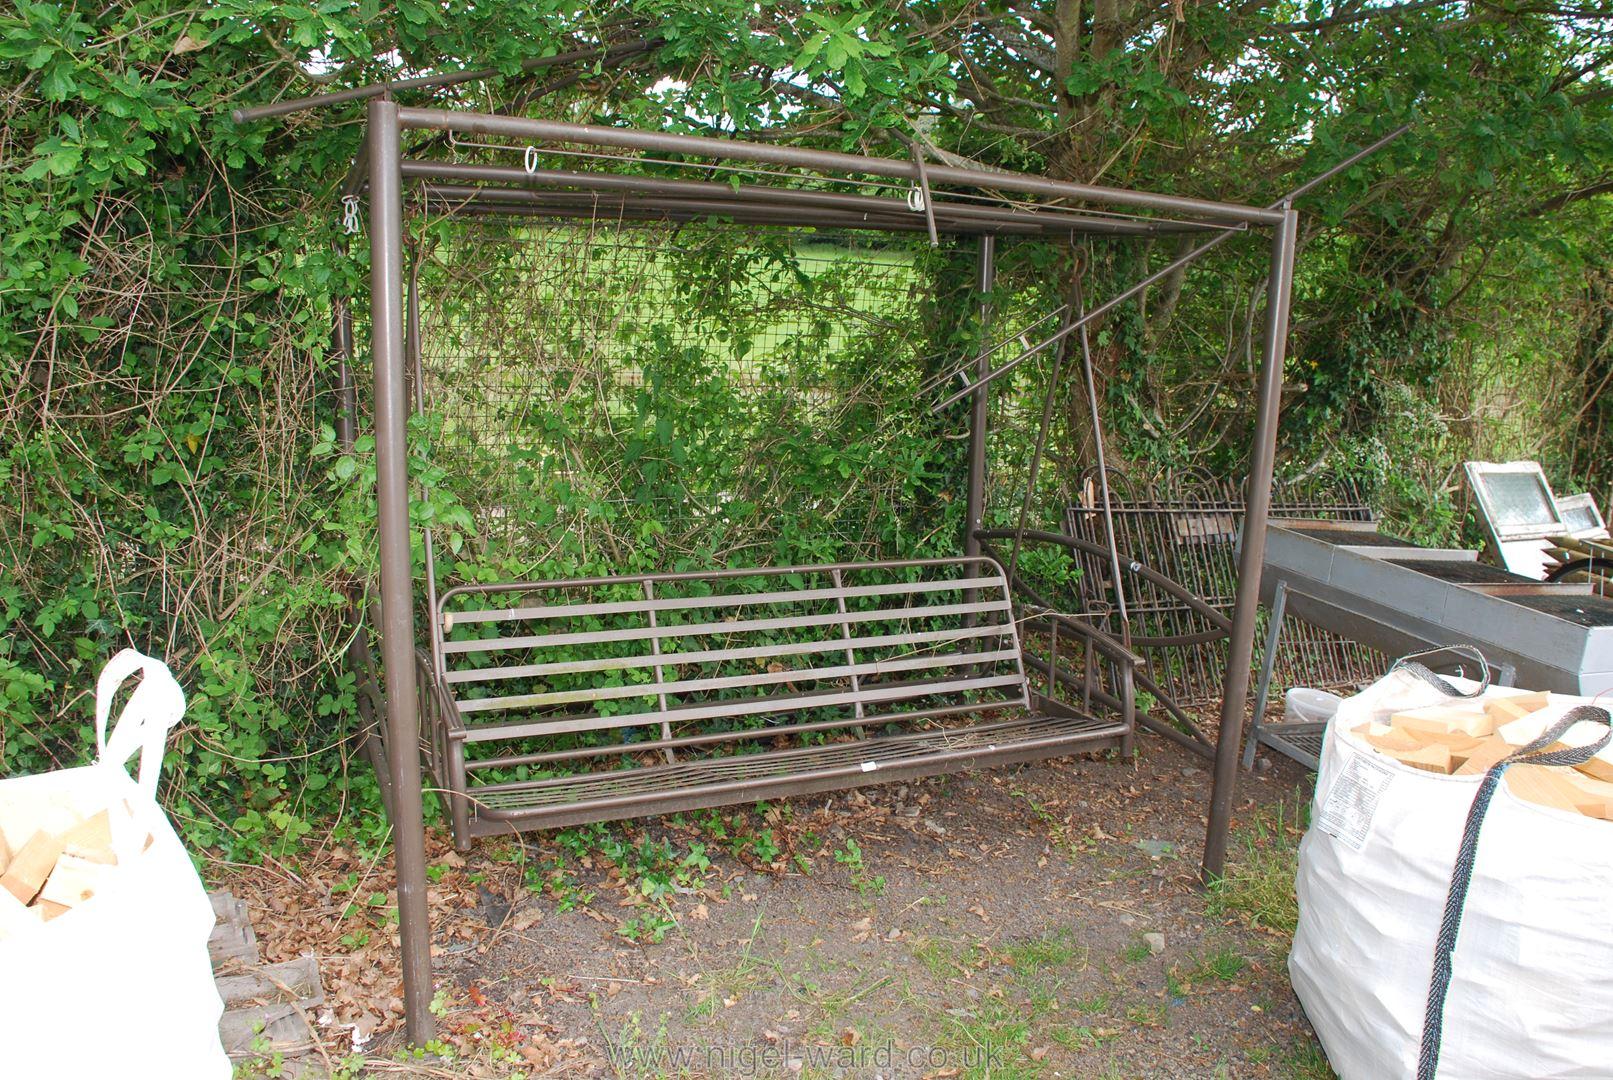 A three seat metal garden Swing seat, a/f (lacking cushions).